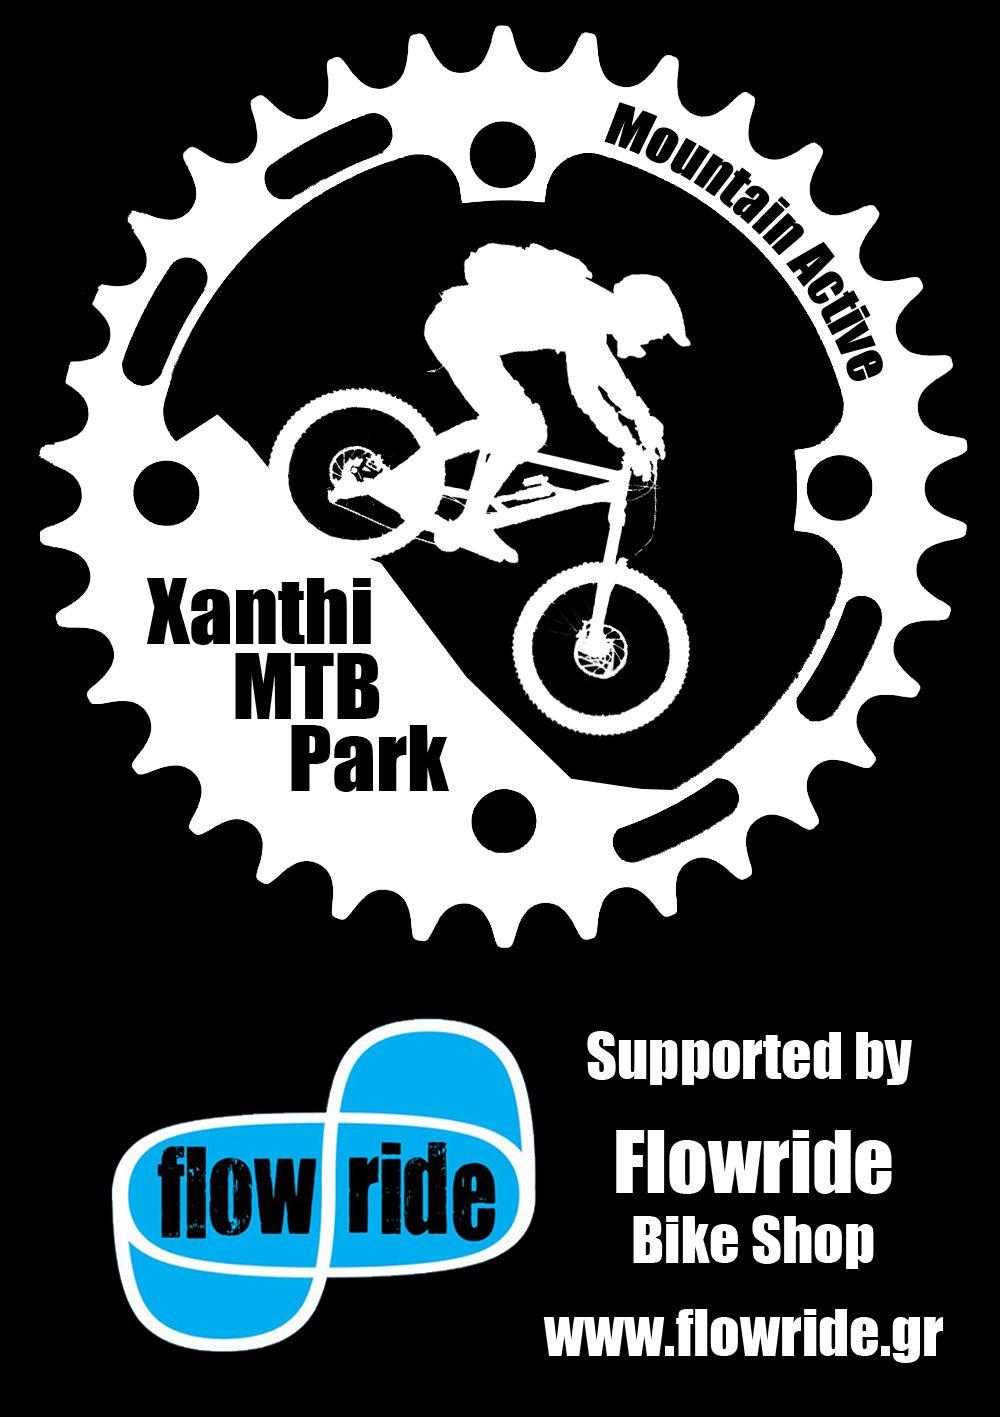 Xanthi Mtb Park Logo New 2012 Flowride Bike Logo Bike Logos